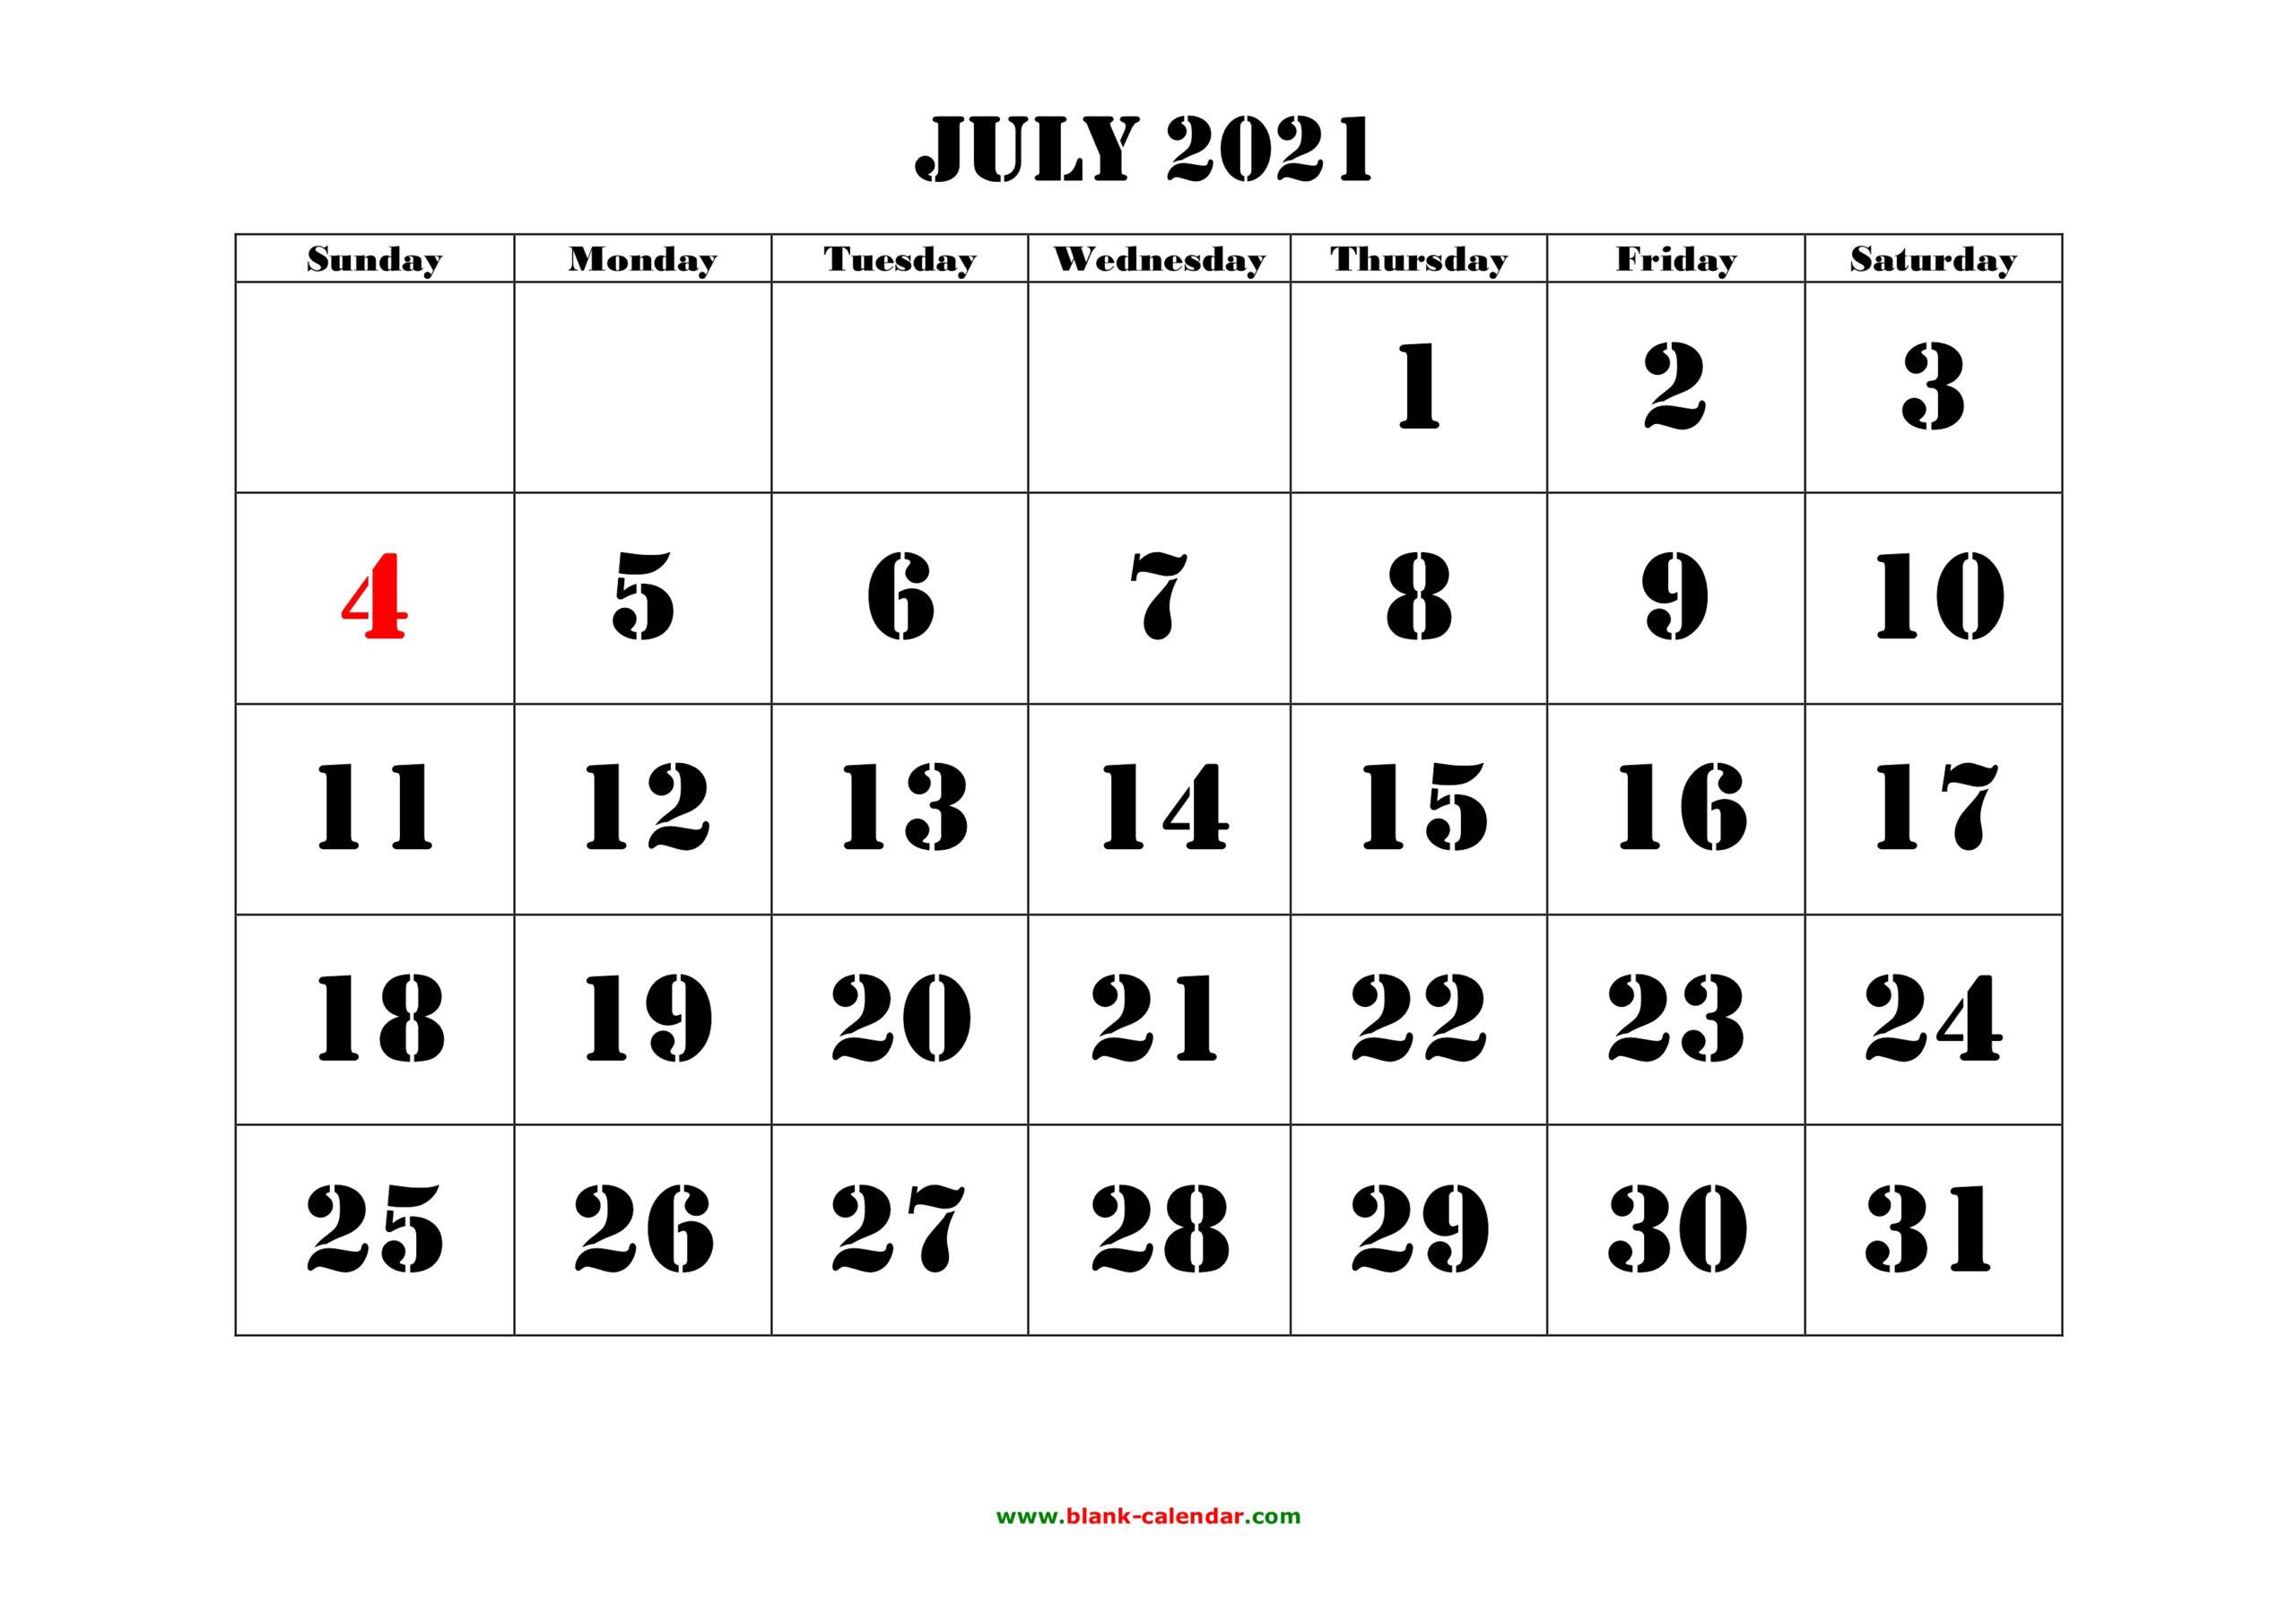 Free Download Printable July 2021 Calendar, Large Font throughout 2021 Large Bold Printable Calendar